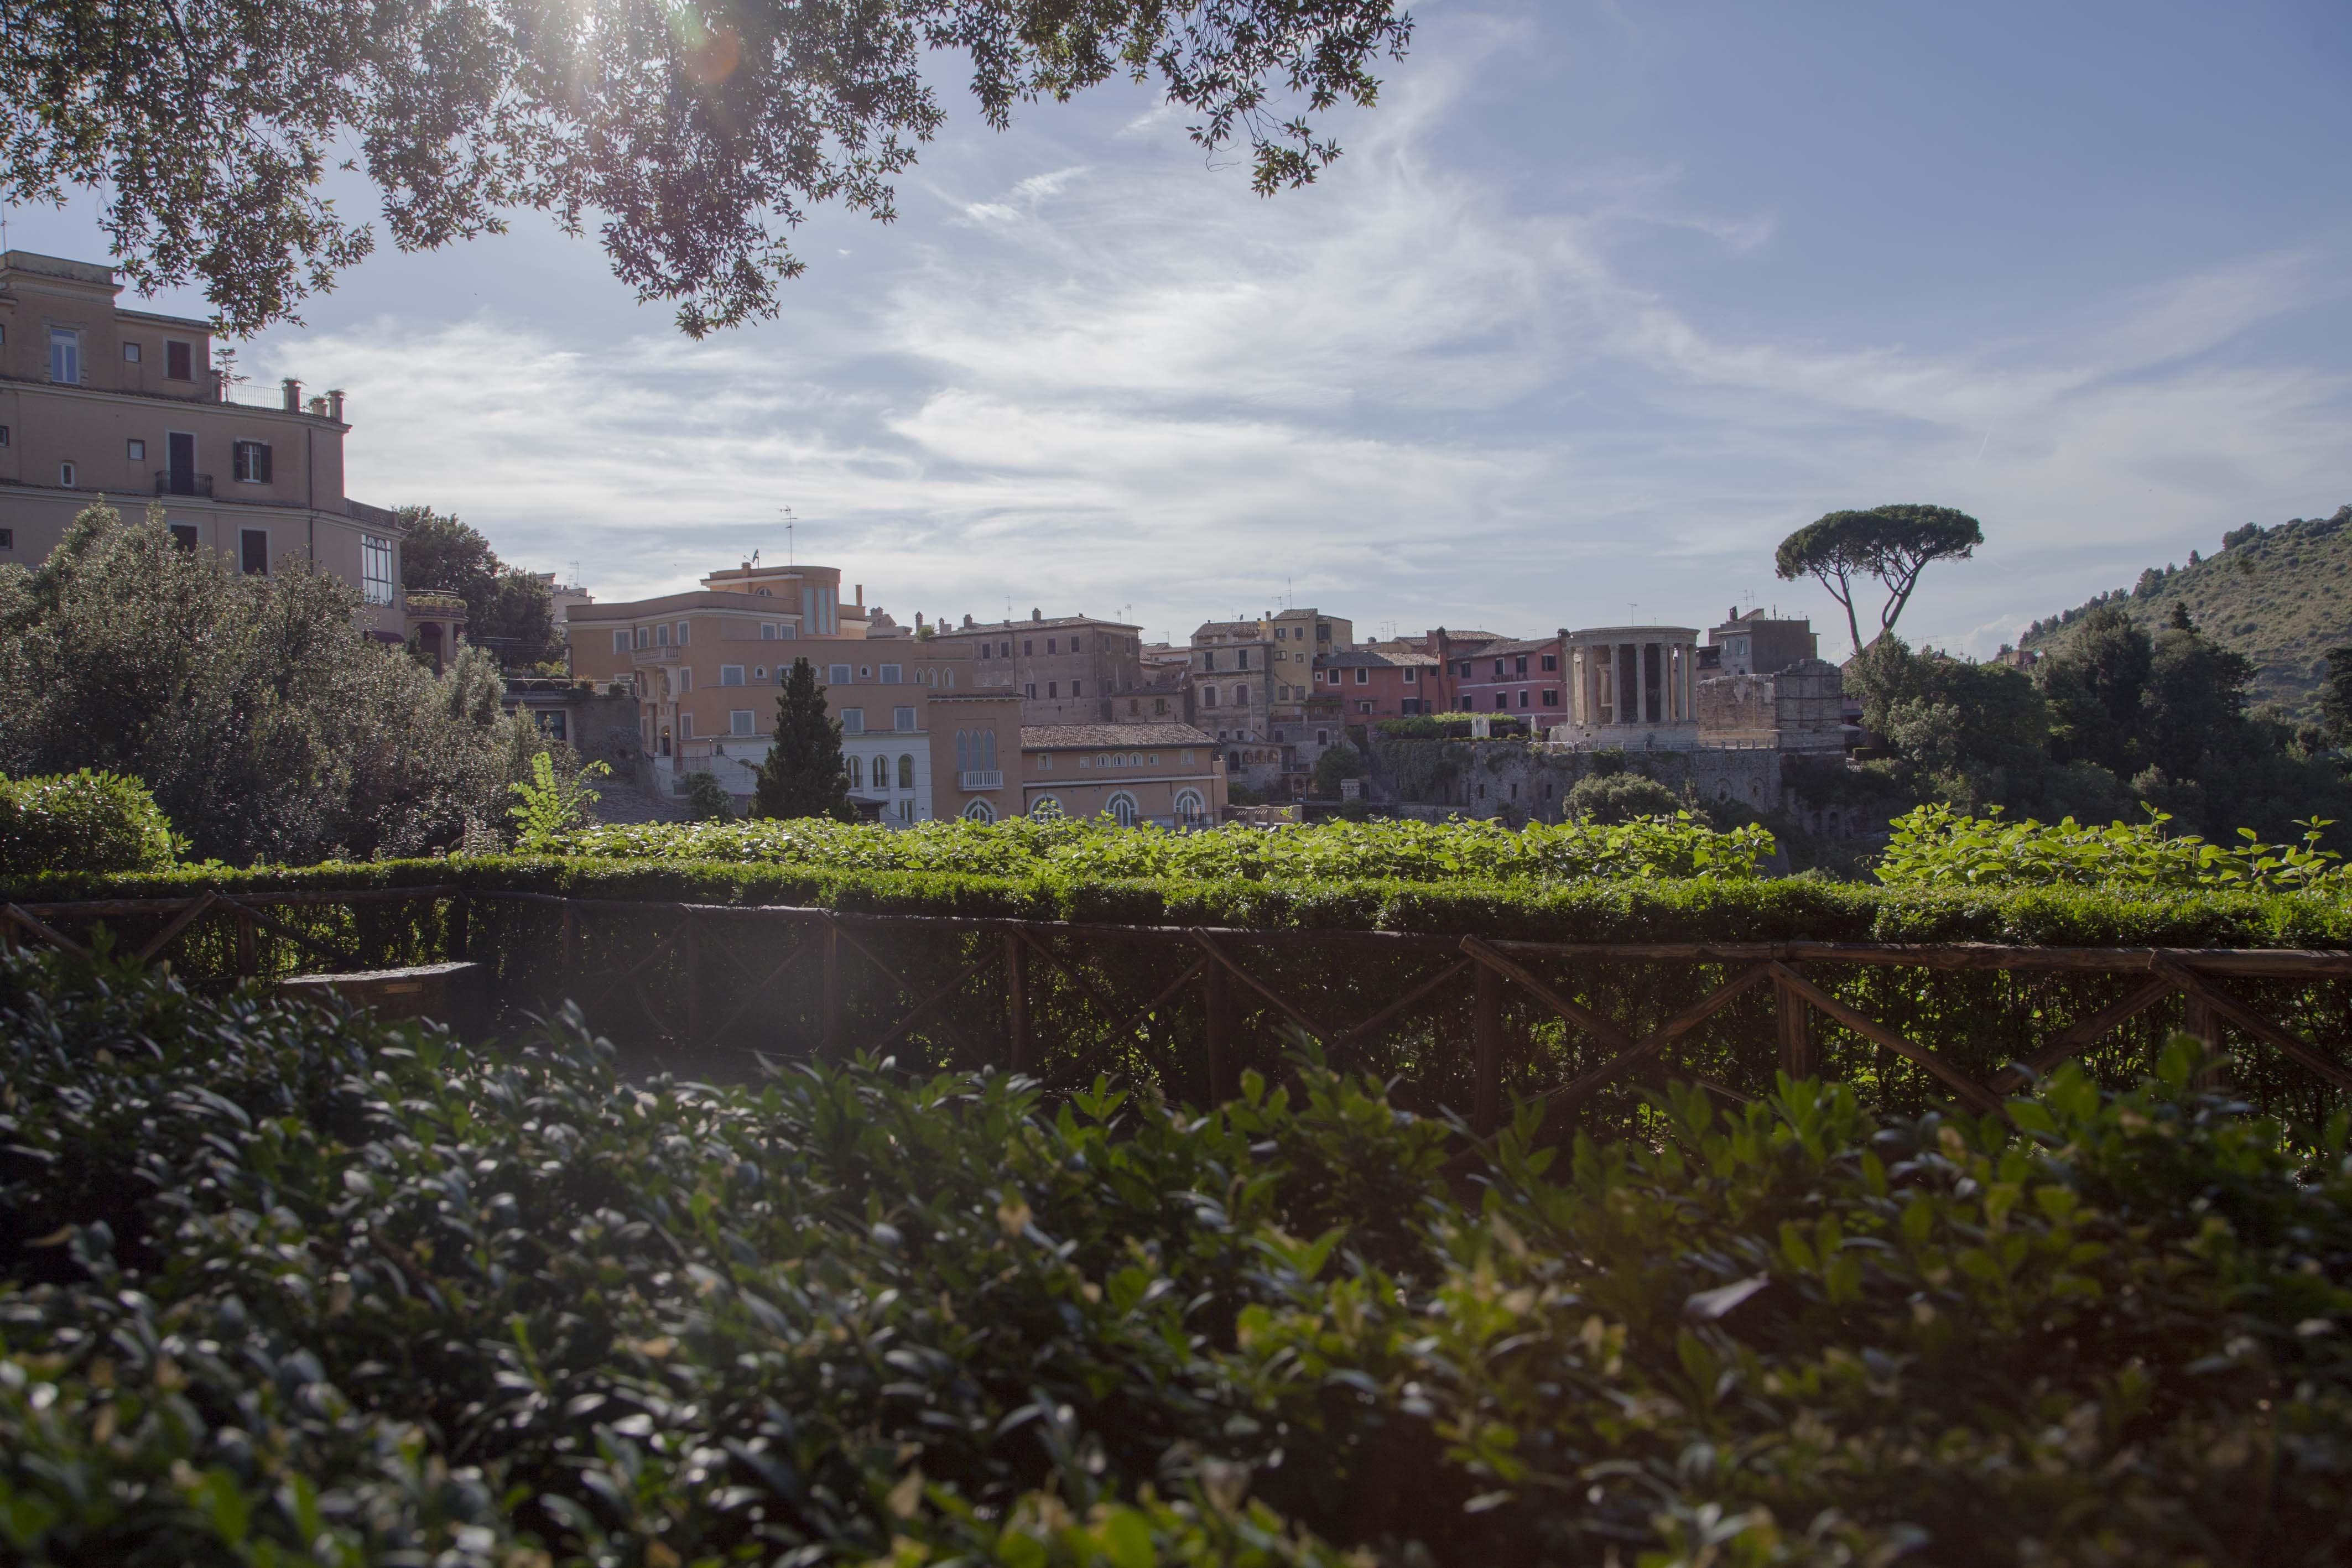 Vista su Tivoli, PARCO VILLA GREGORIANA, TIVOLI, ROMA